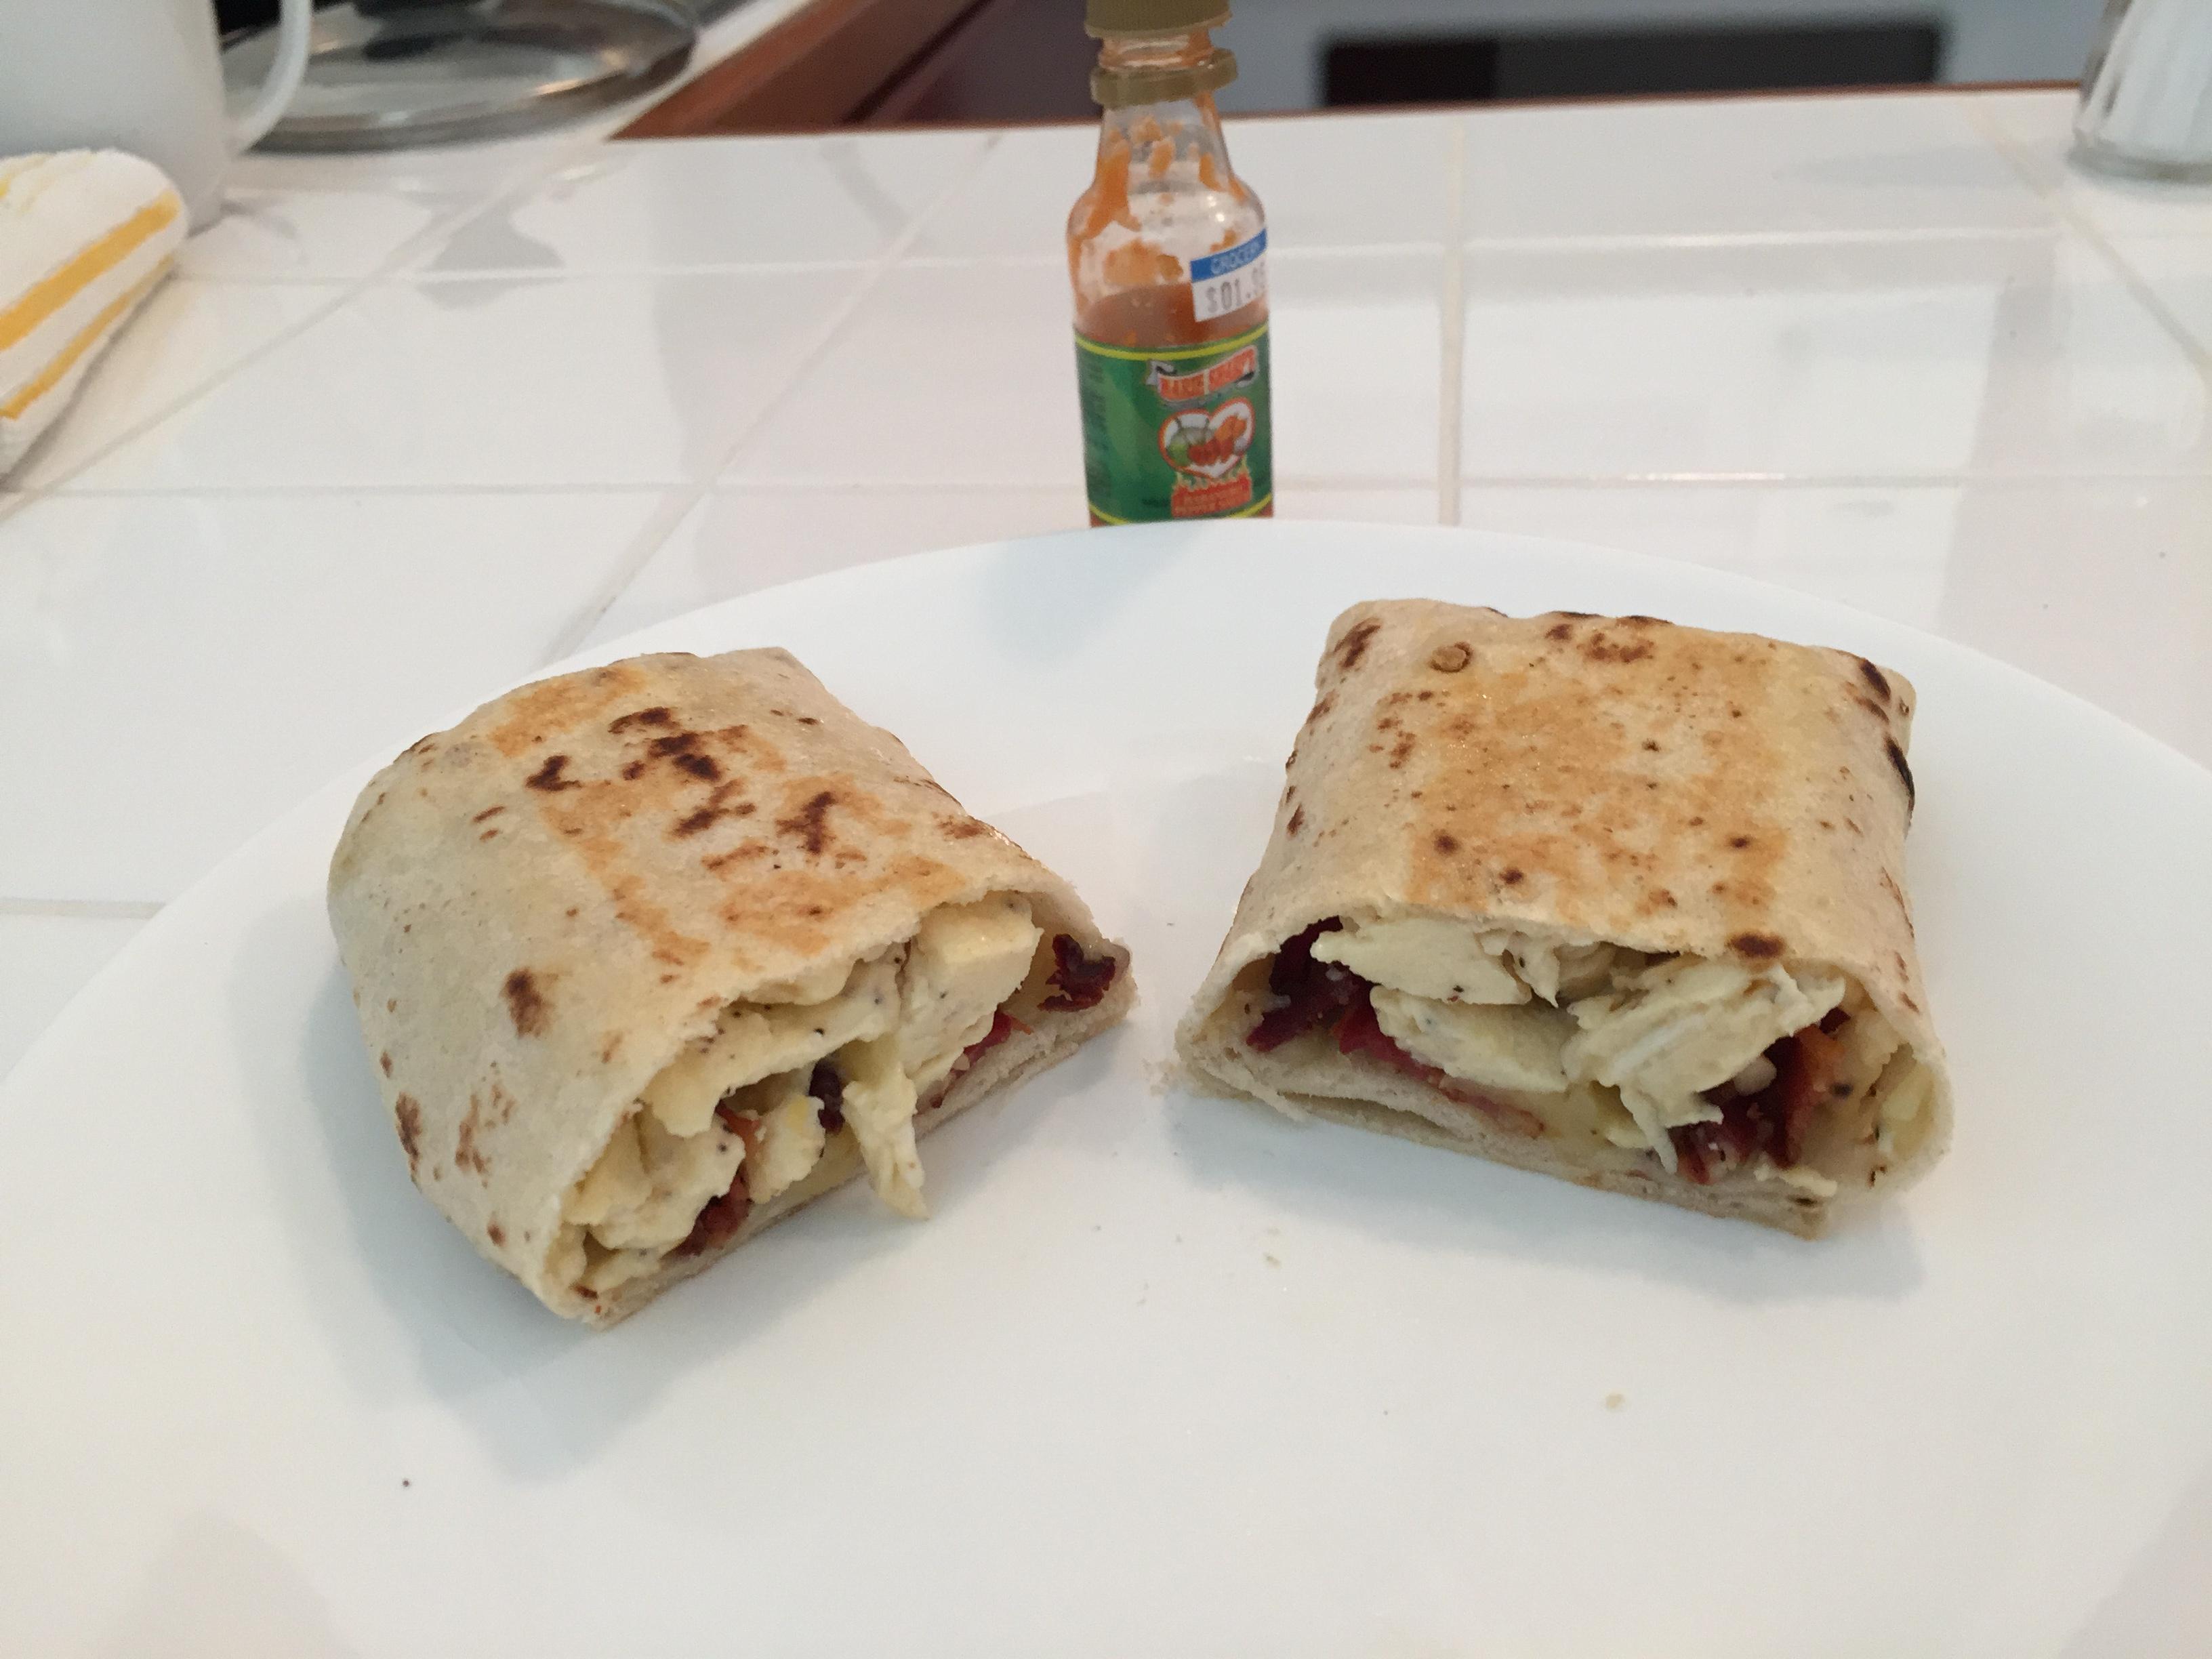 Home made Breakfast Burrito $3